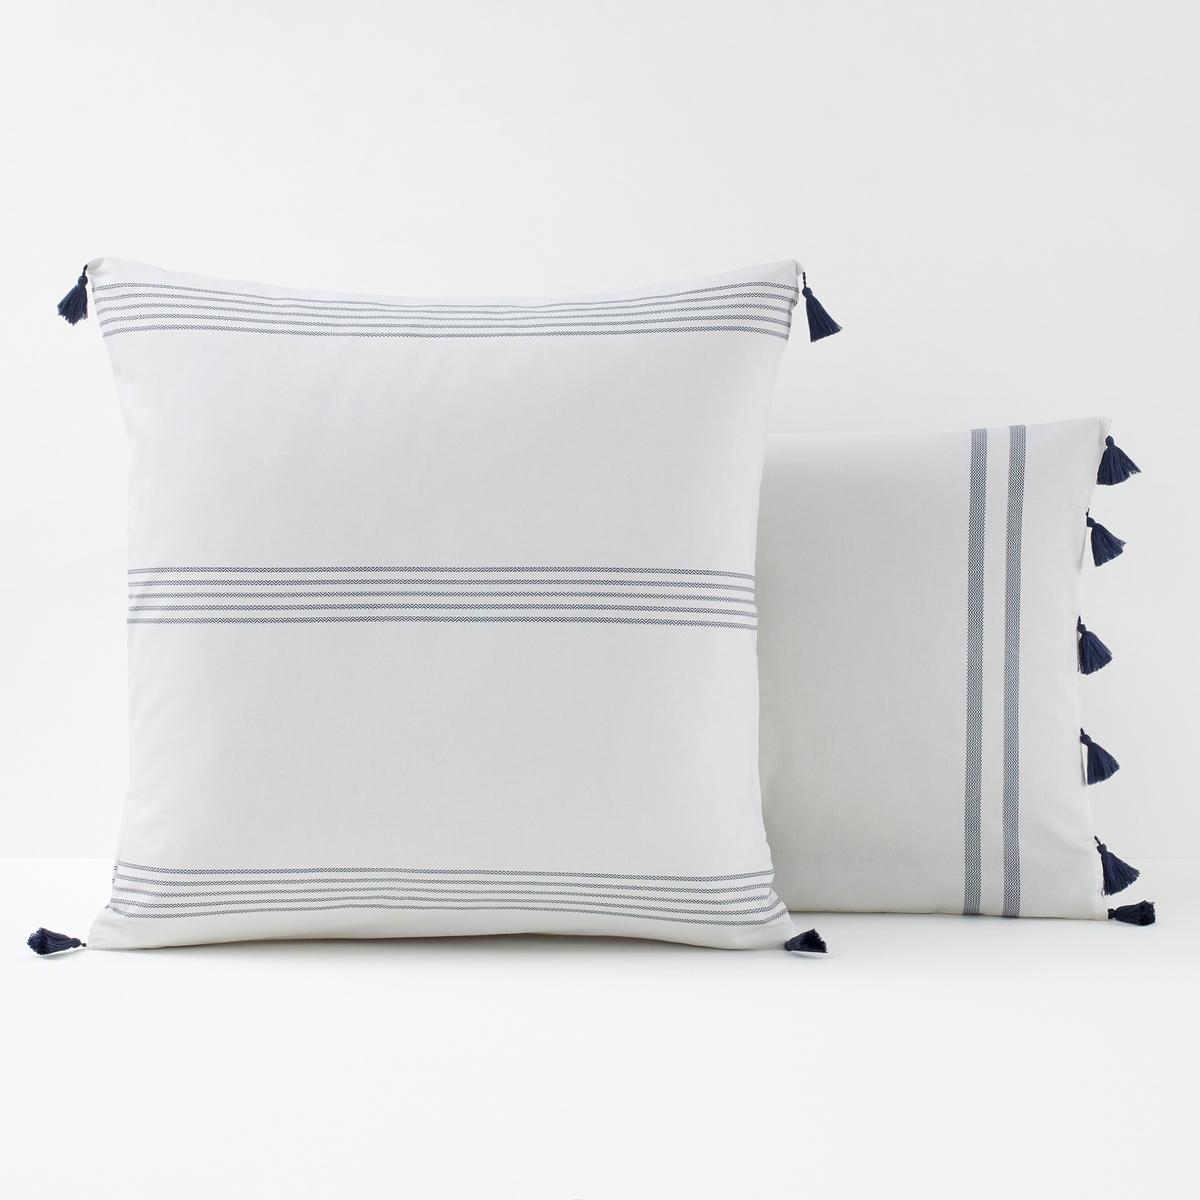 Наволочка La Redoute С рисунком RIAD 63 x 63 см белый чехол la redoute для подушки или наволочка однотонного цвета с помпонами riad 65 x 65 см розовый